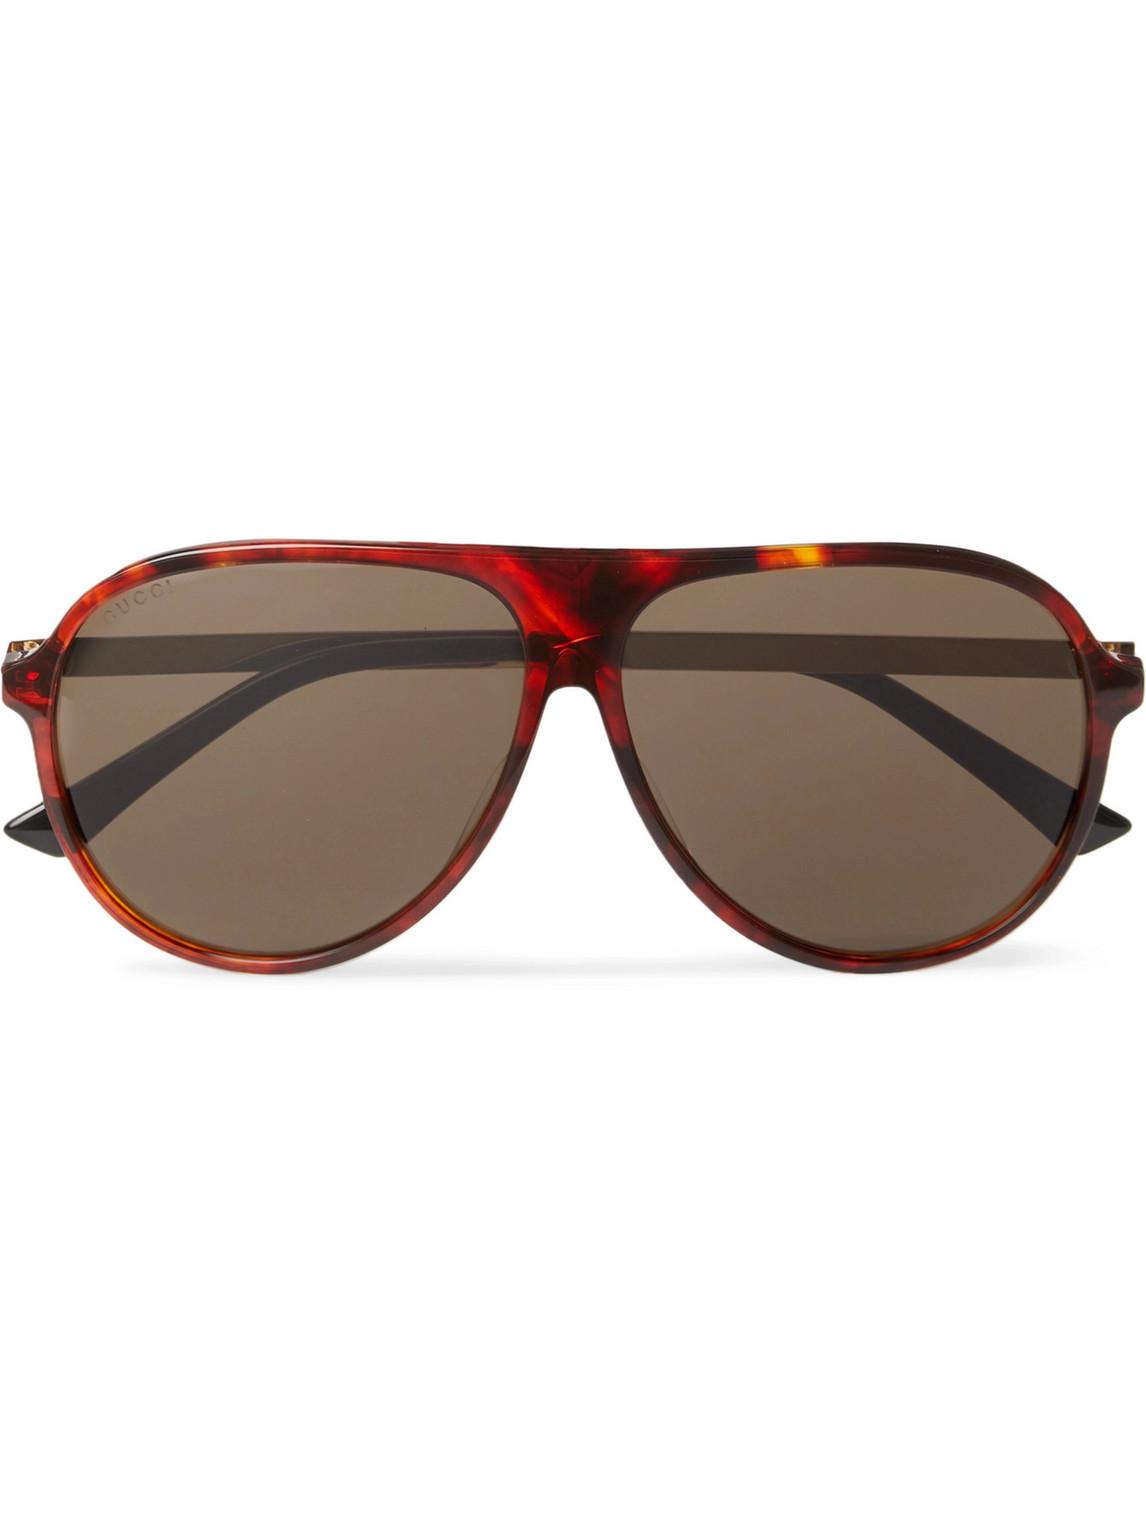 Gucci - Aviator-Style Tortoiseshell Acetate And Gold-Tone Sunglasses - Men - Tortoiseshell